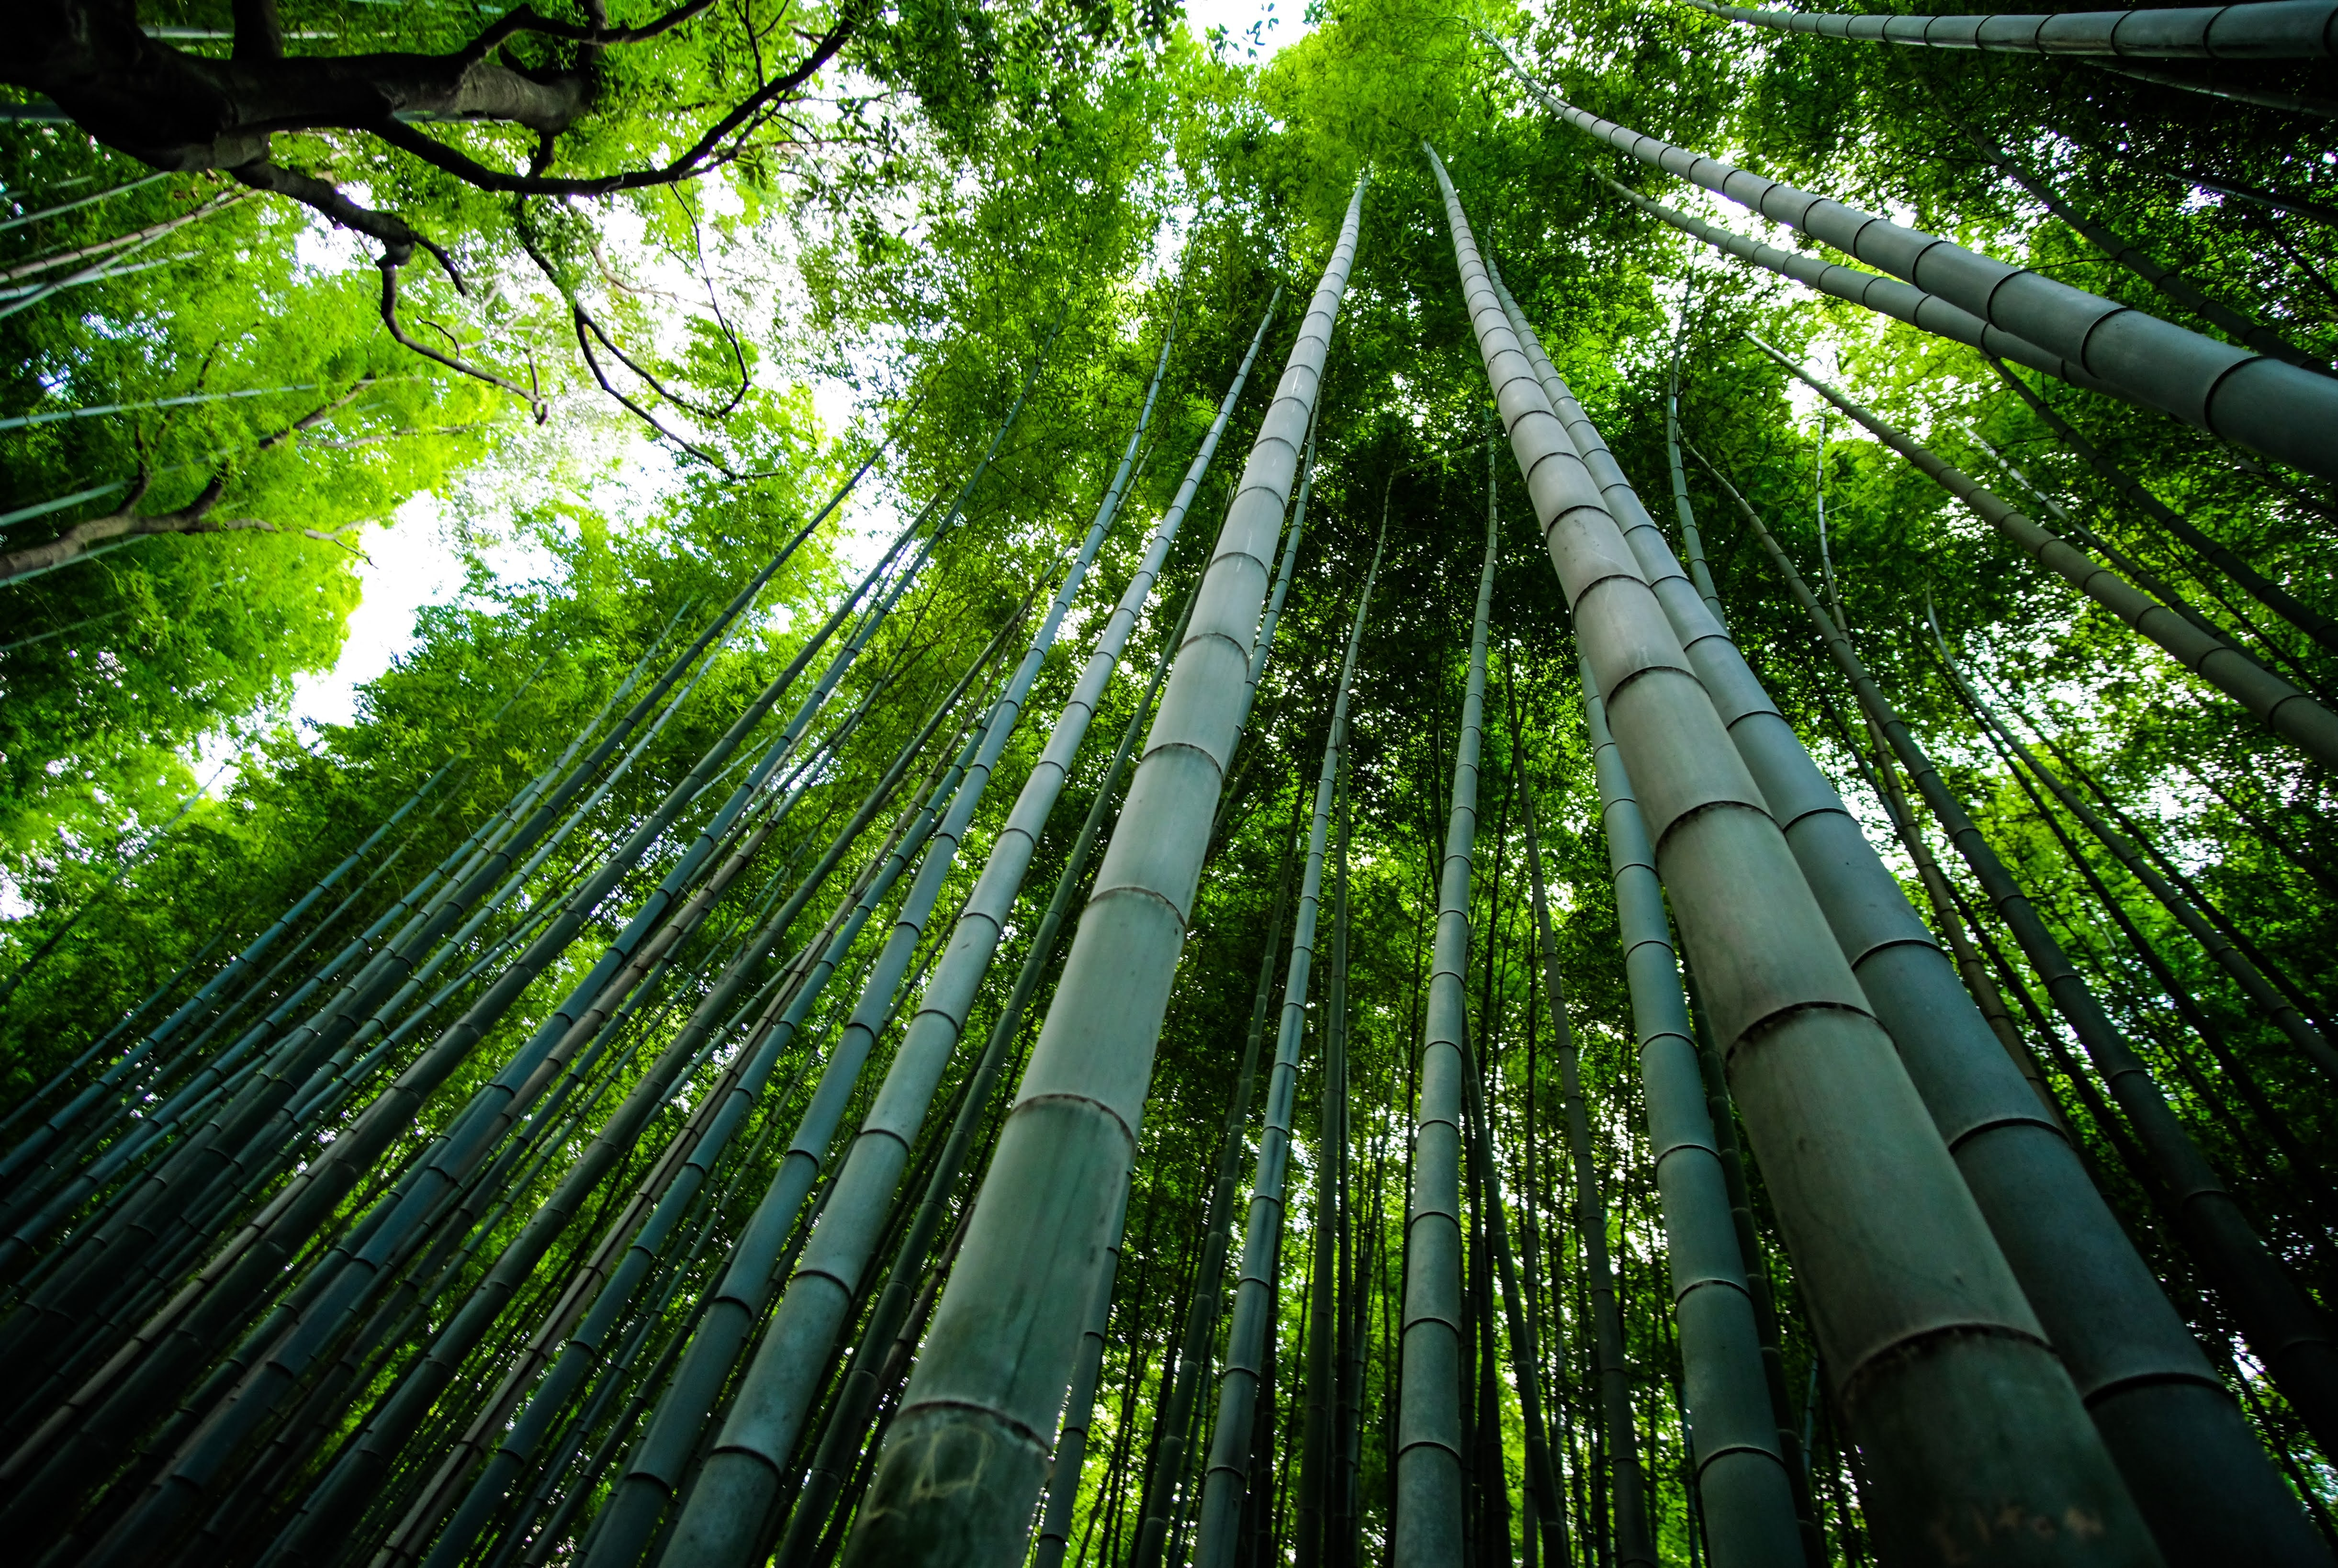 MakersValley Blog | alternatives to cotton | bamboo